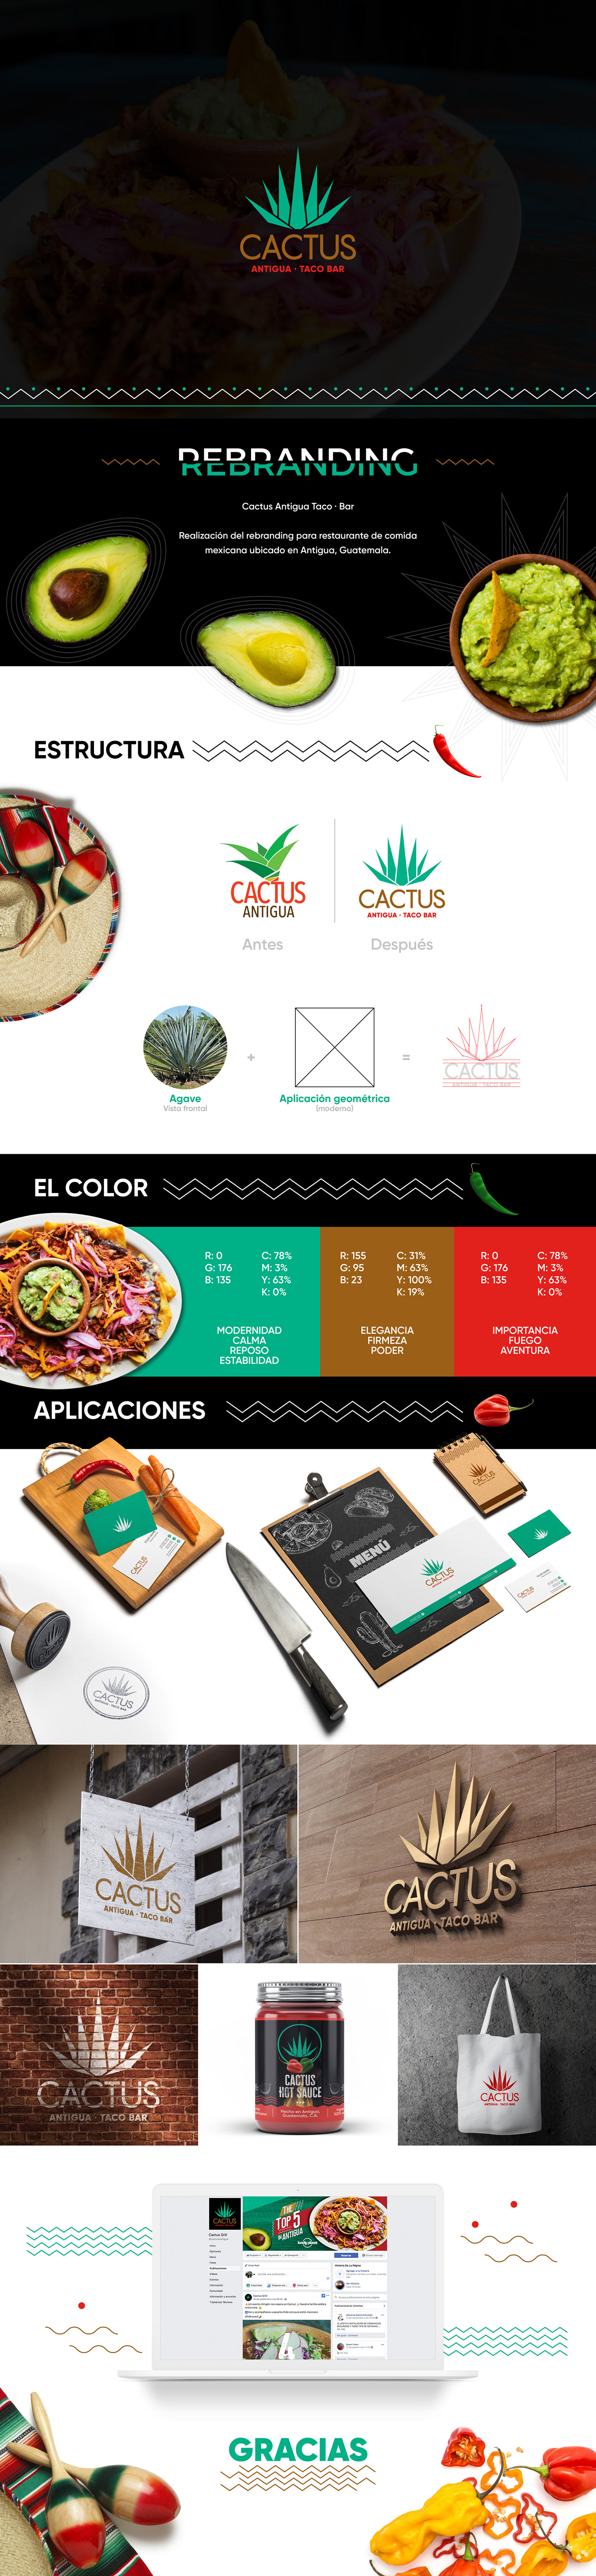 cactus brand marca rebranding restaurant mexico Mexican Food Guatemala Tacos logo food